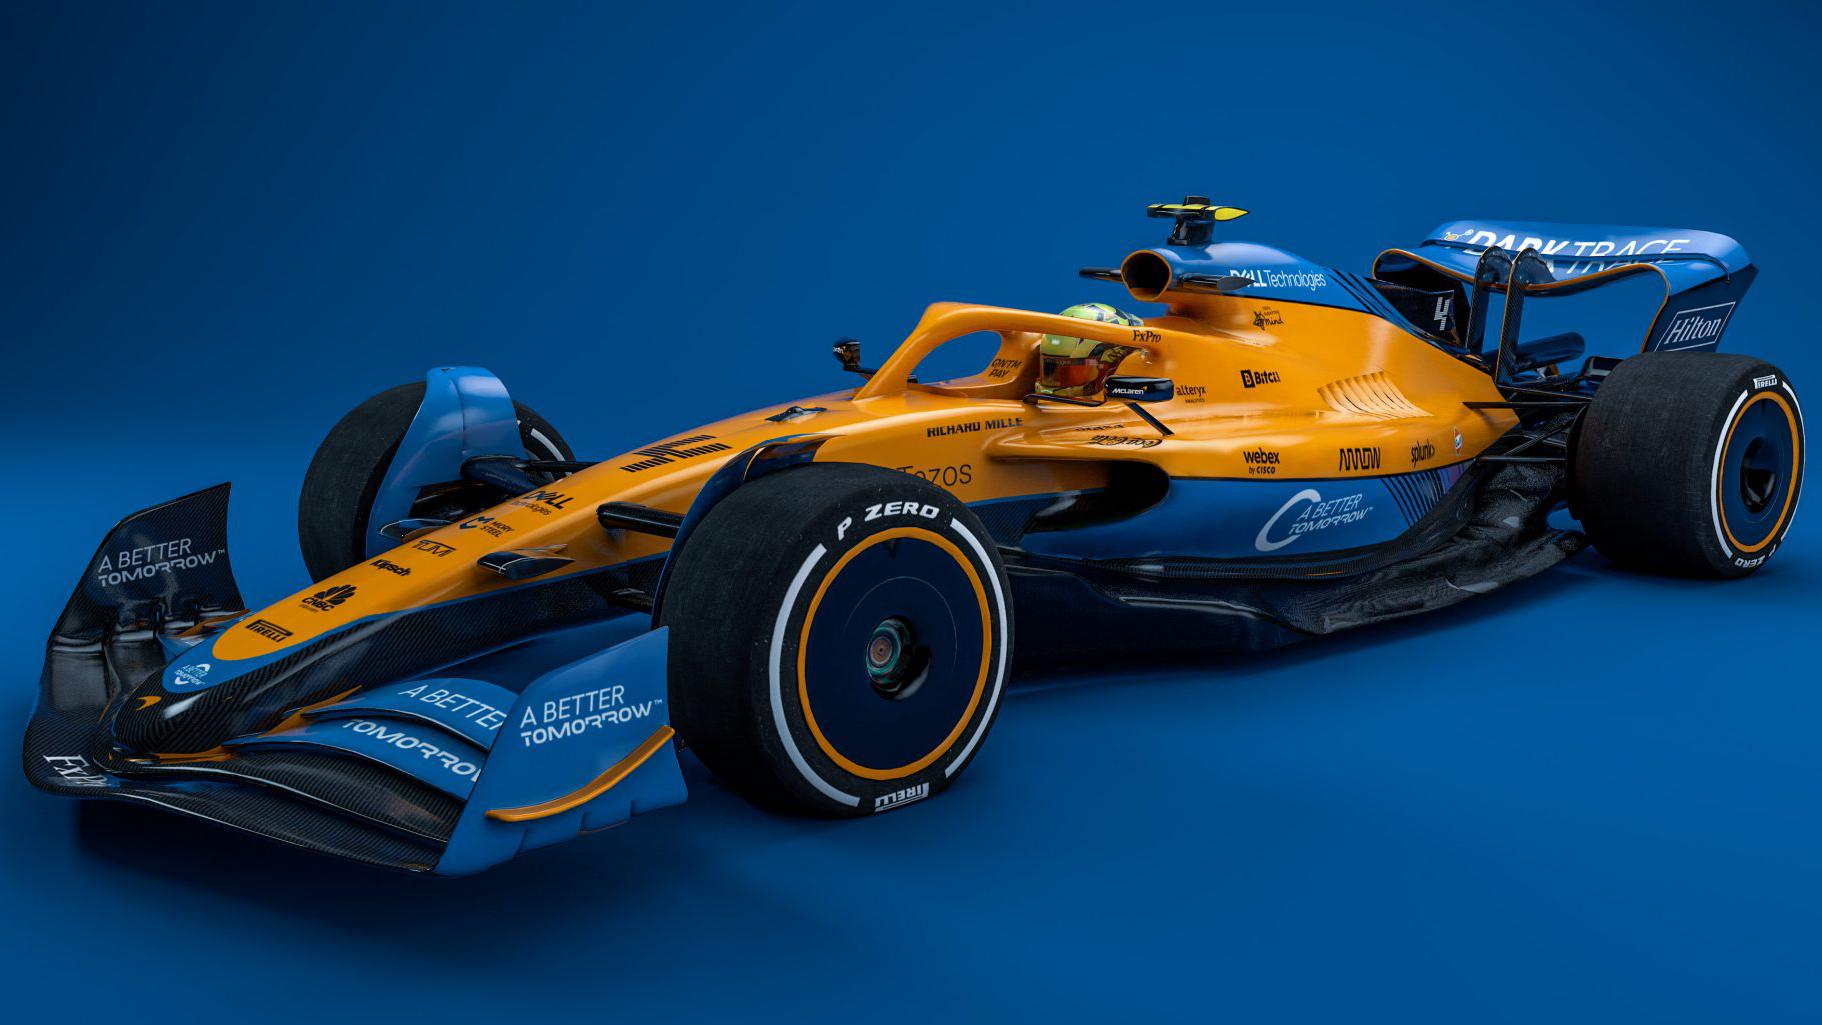 Carro-conceito da F1 para 2022 visto 3/4 de frente com as cores da McLaren